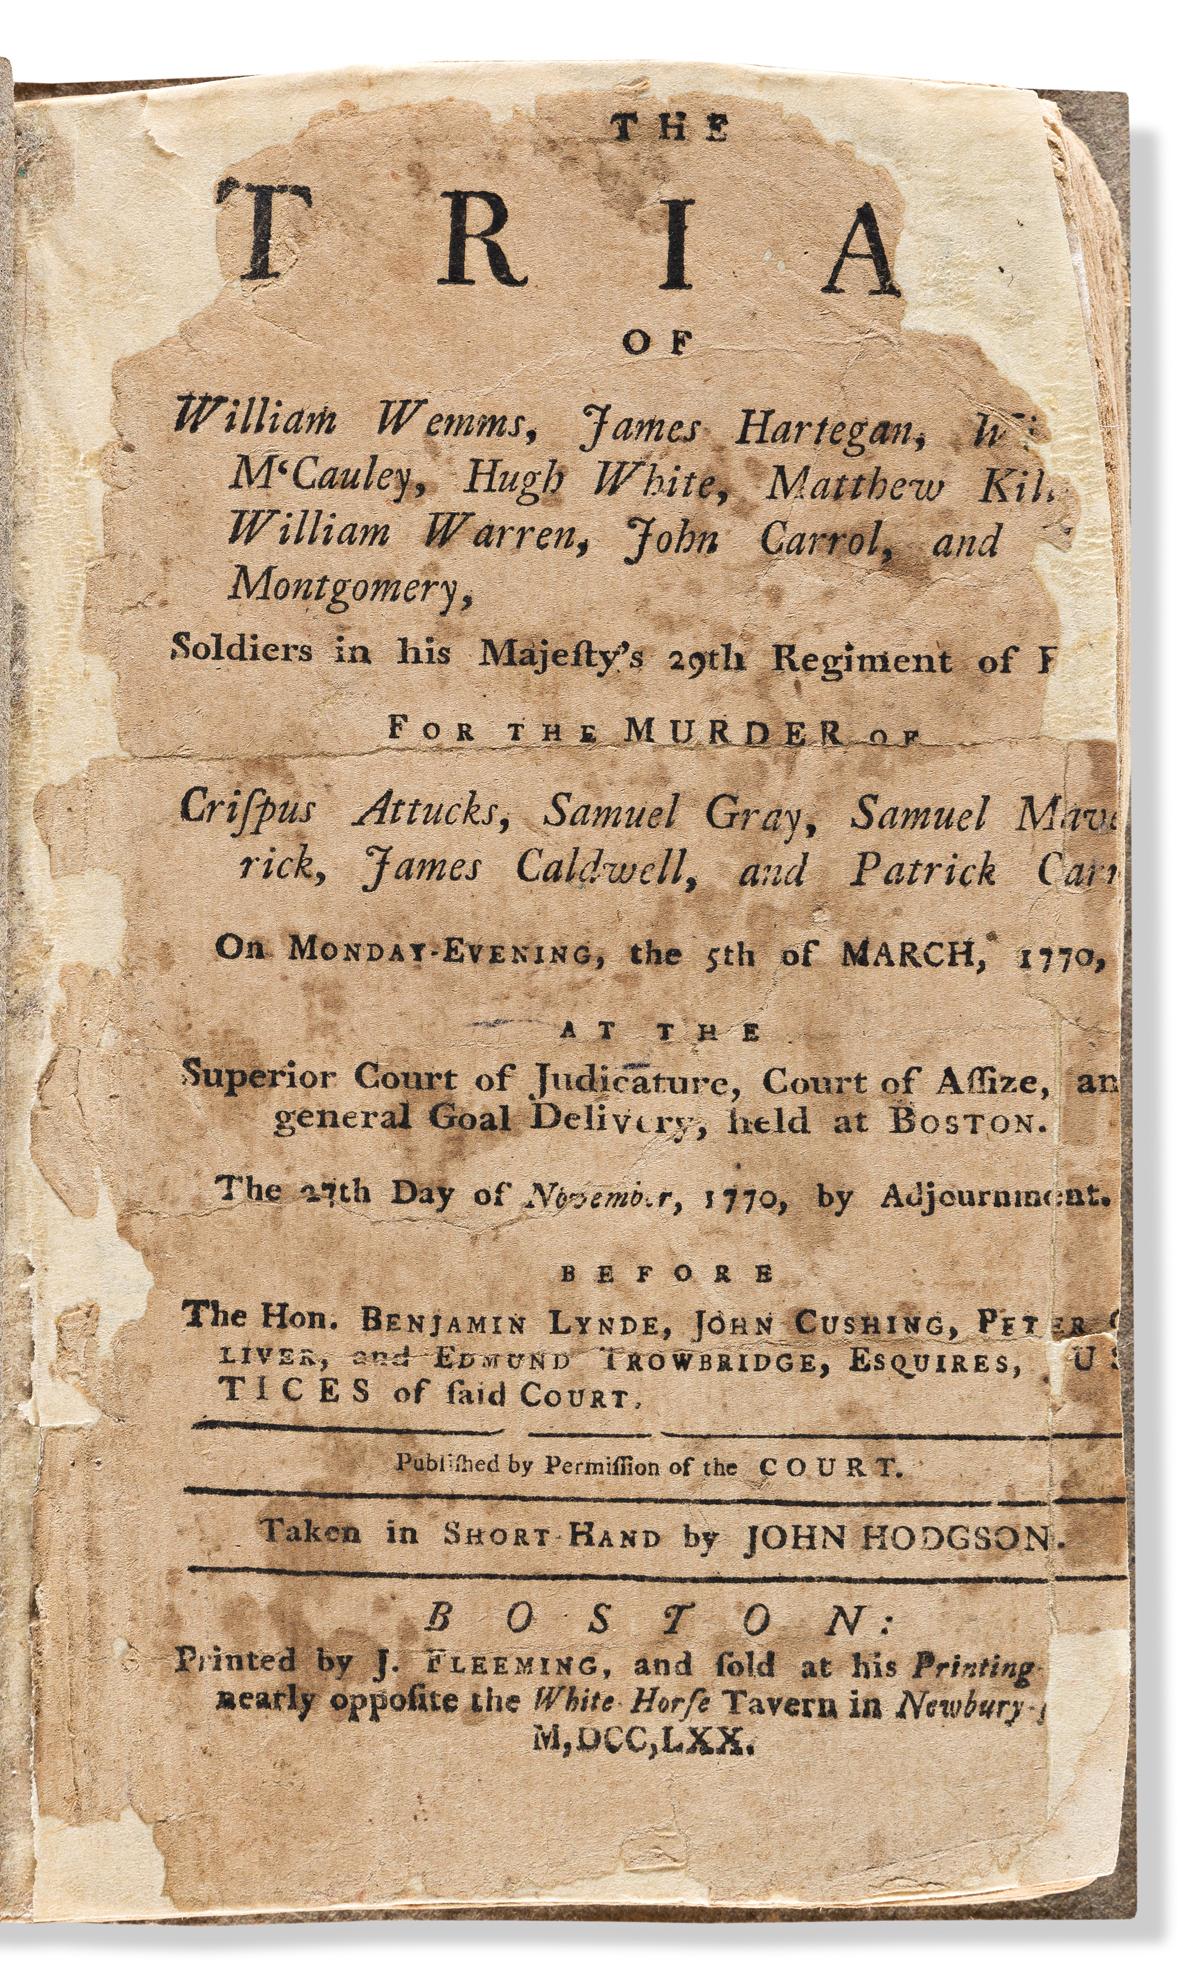 (AMERICAN REVOLUTION--PRELUDE.) John Hodgson; reporter. The Trial of William Wemms . . . for the Murder of Crispus Attucks.